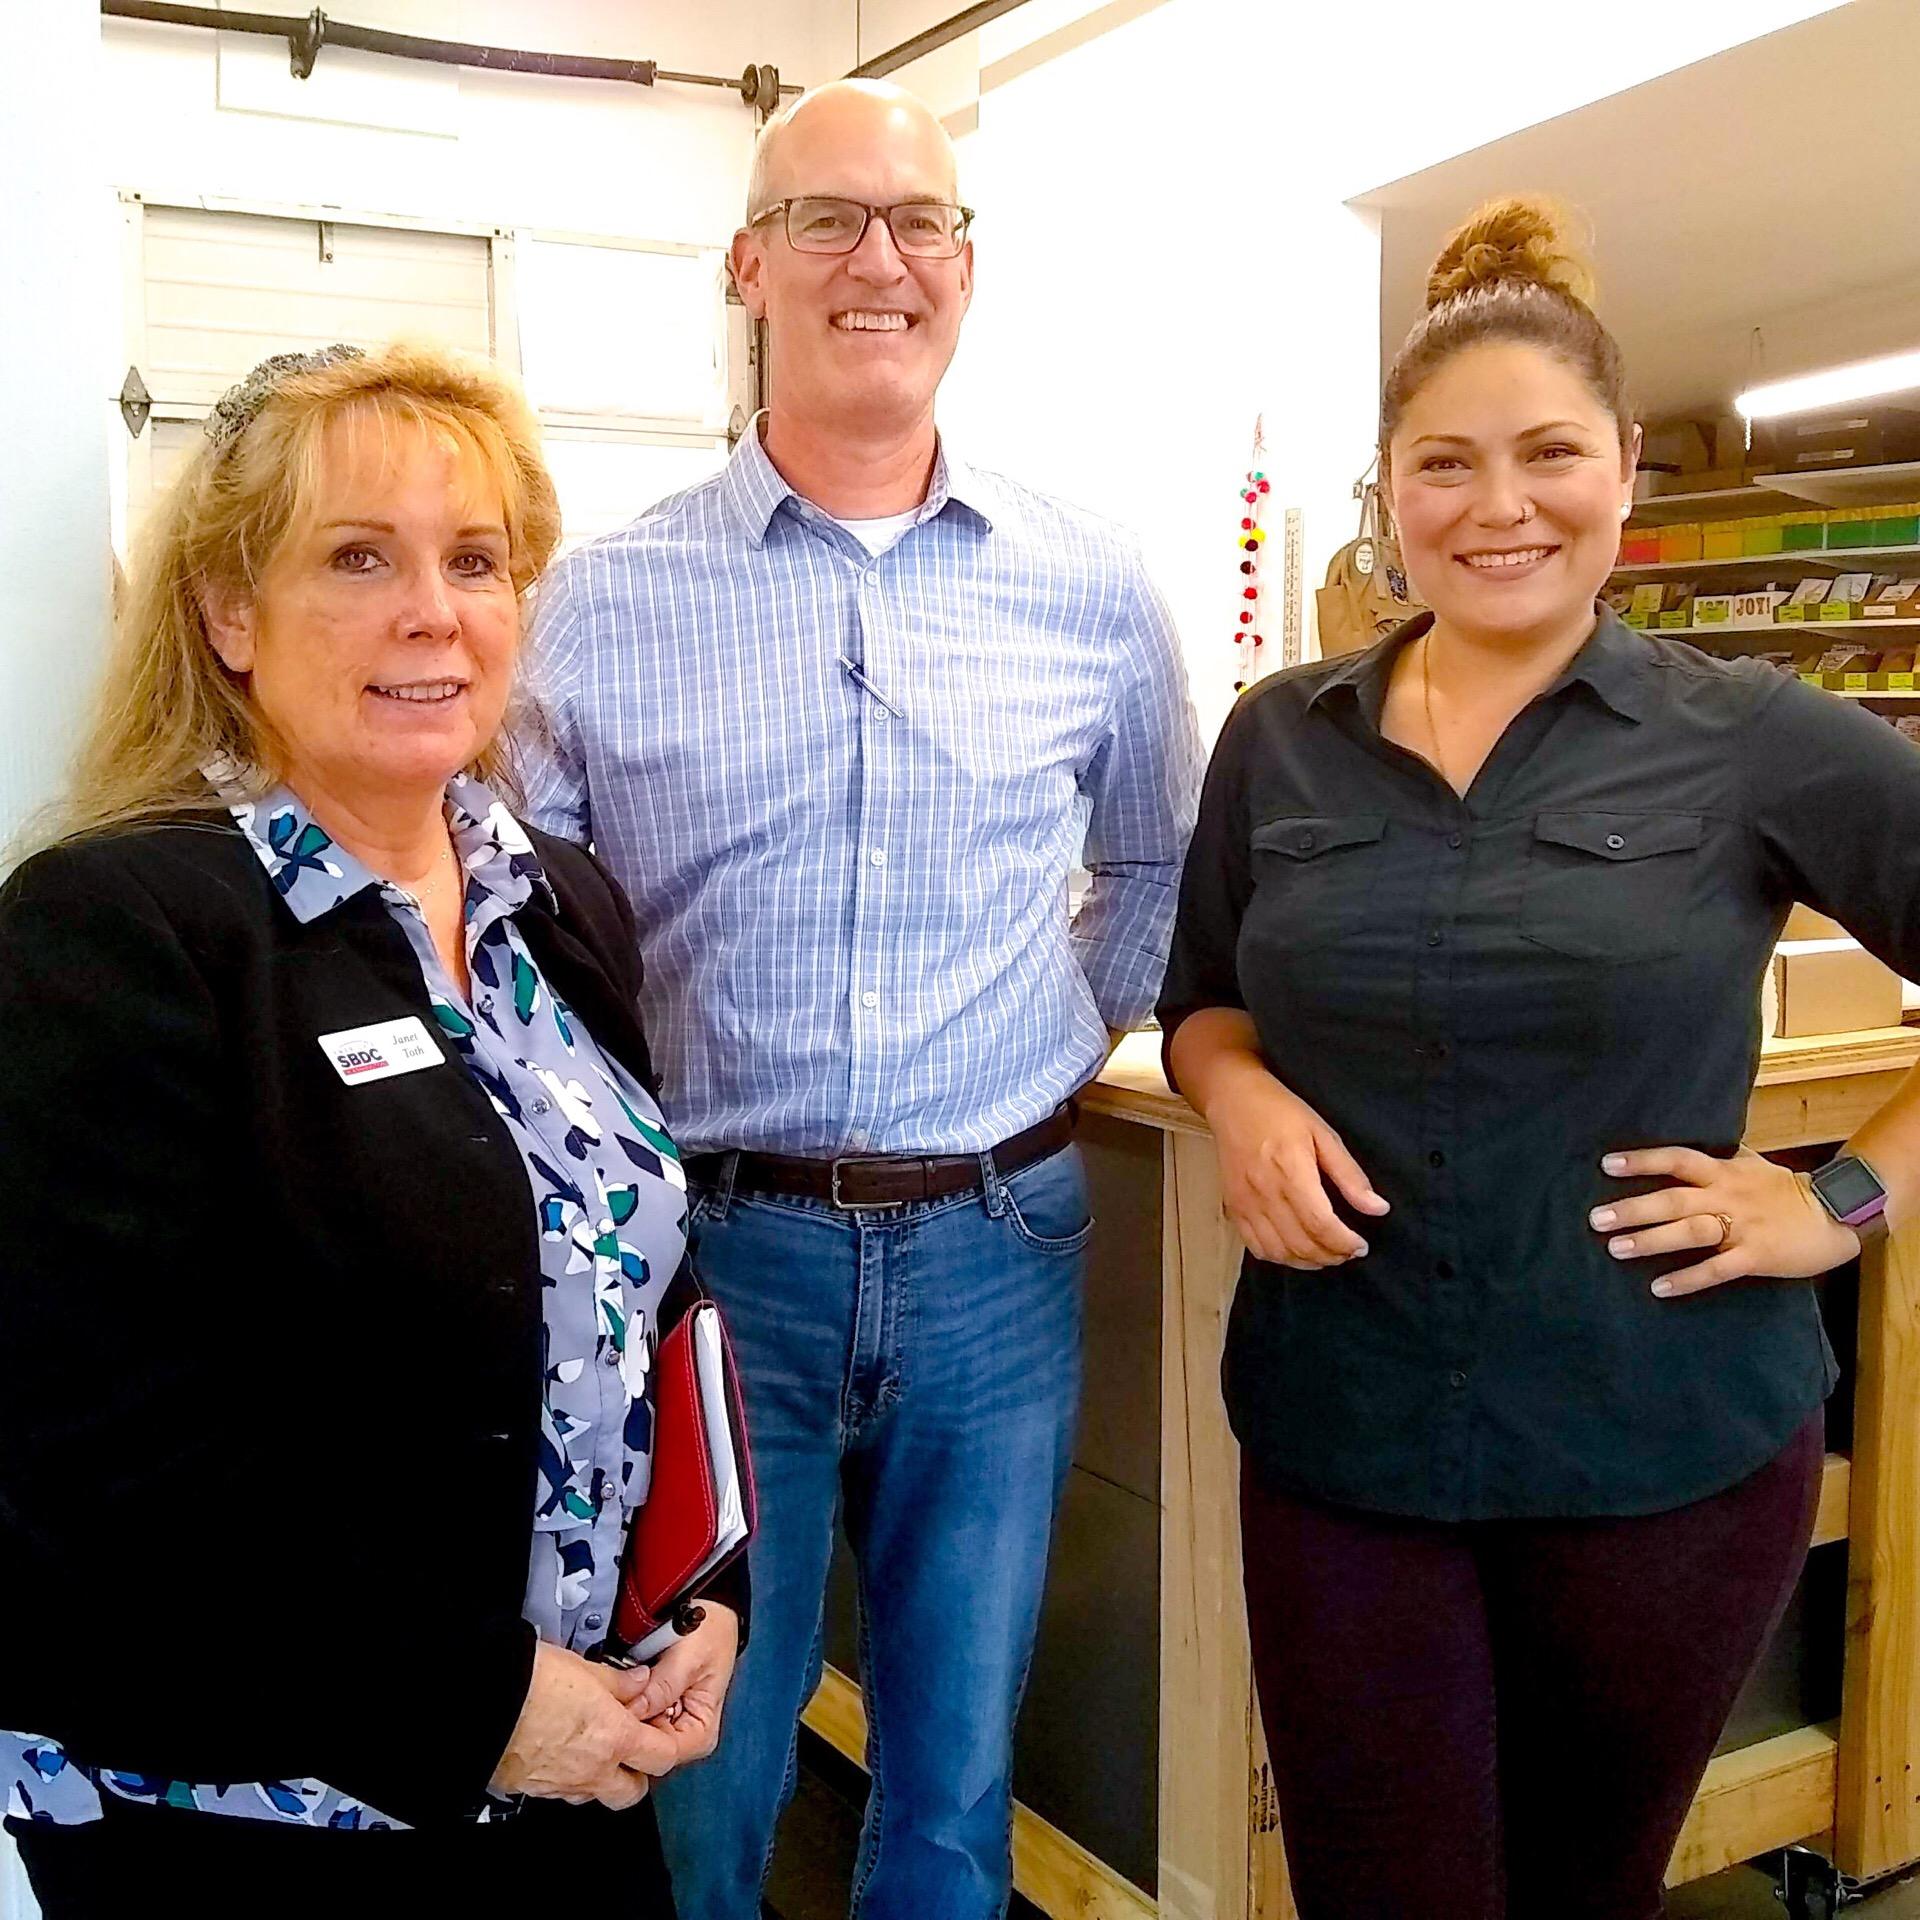 Pictured L-R: Janet Toth (SBDC Business Advisor), U.S. Congressman Rick Larsen (WA State District 2), Cat Snapp